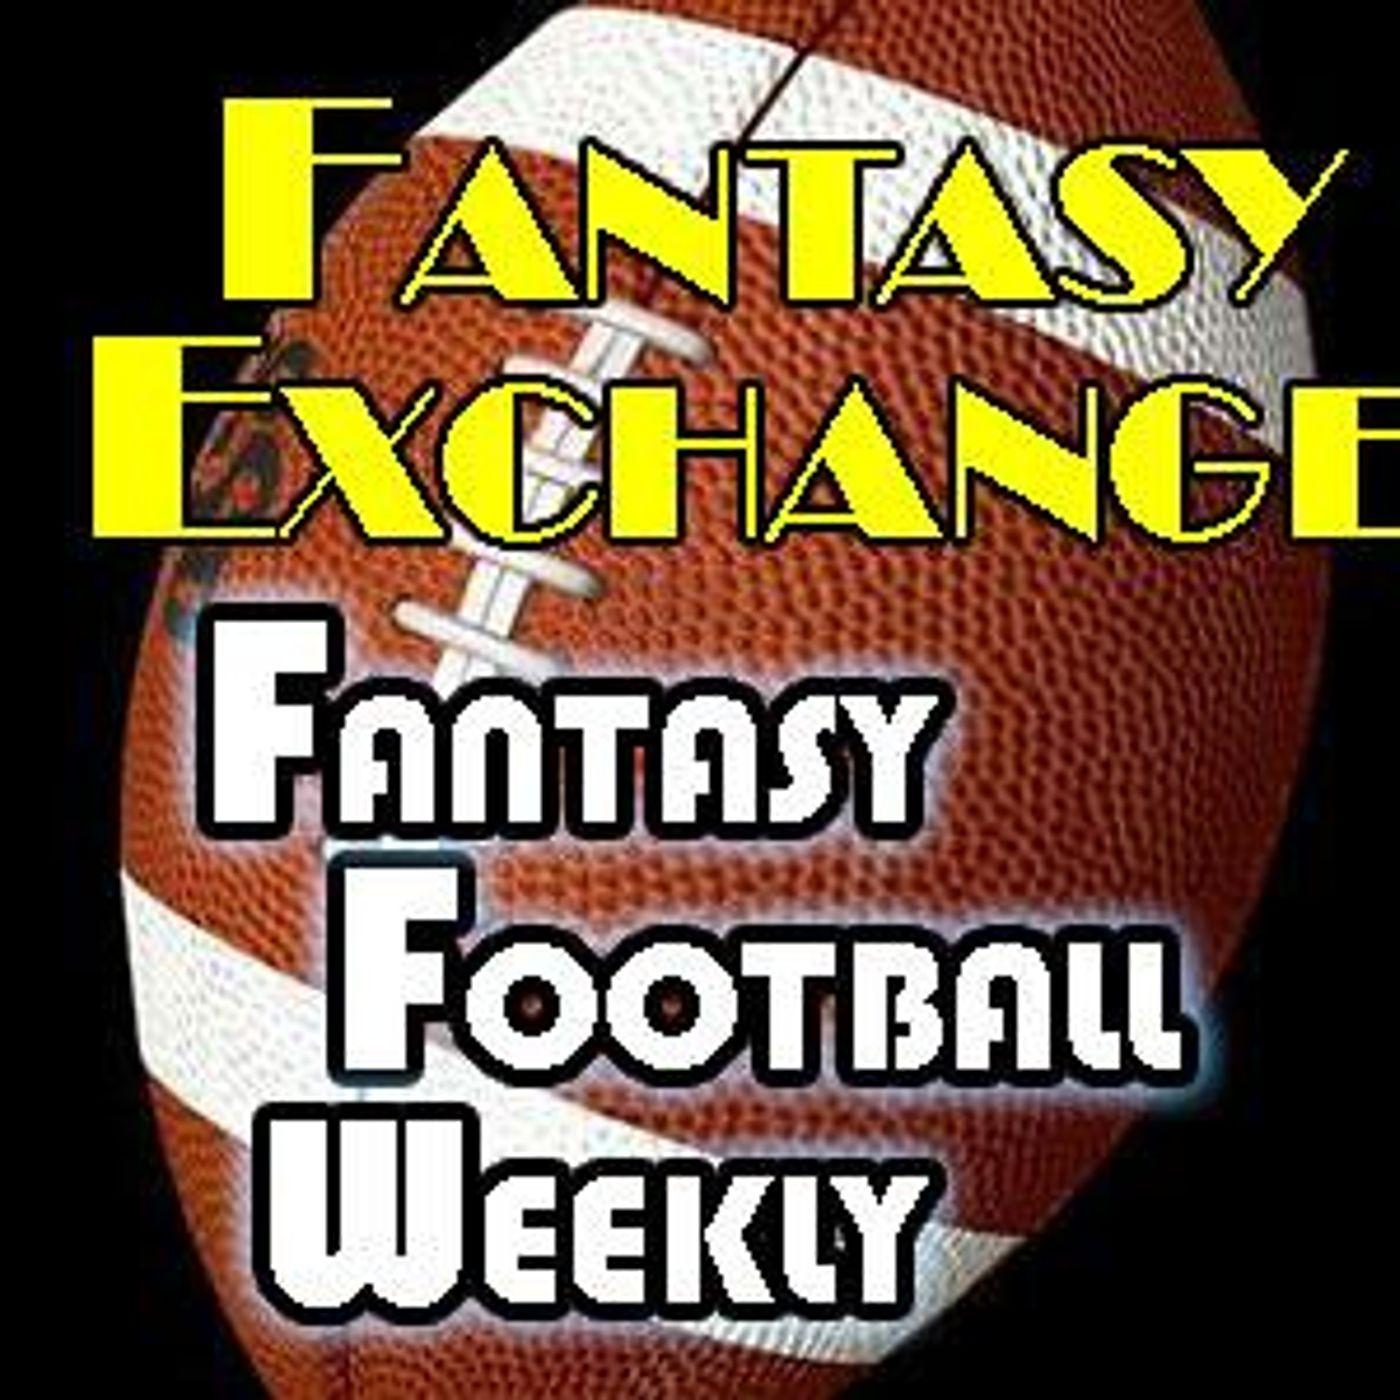 Fantasy Football Weekly